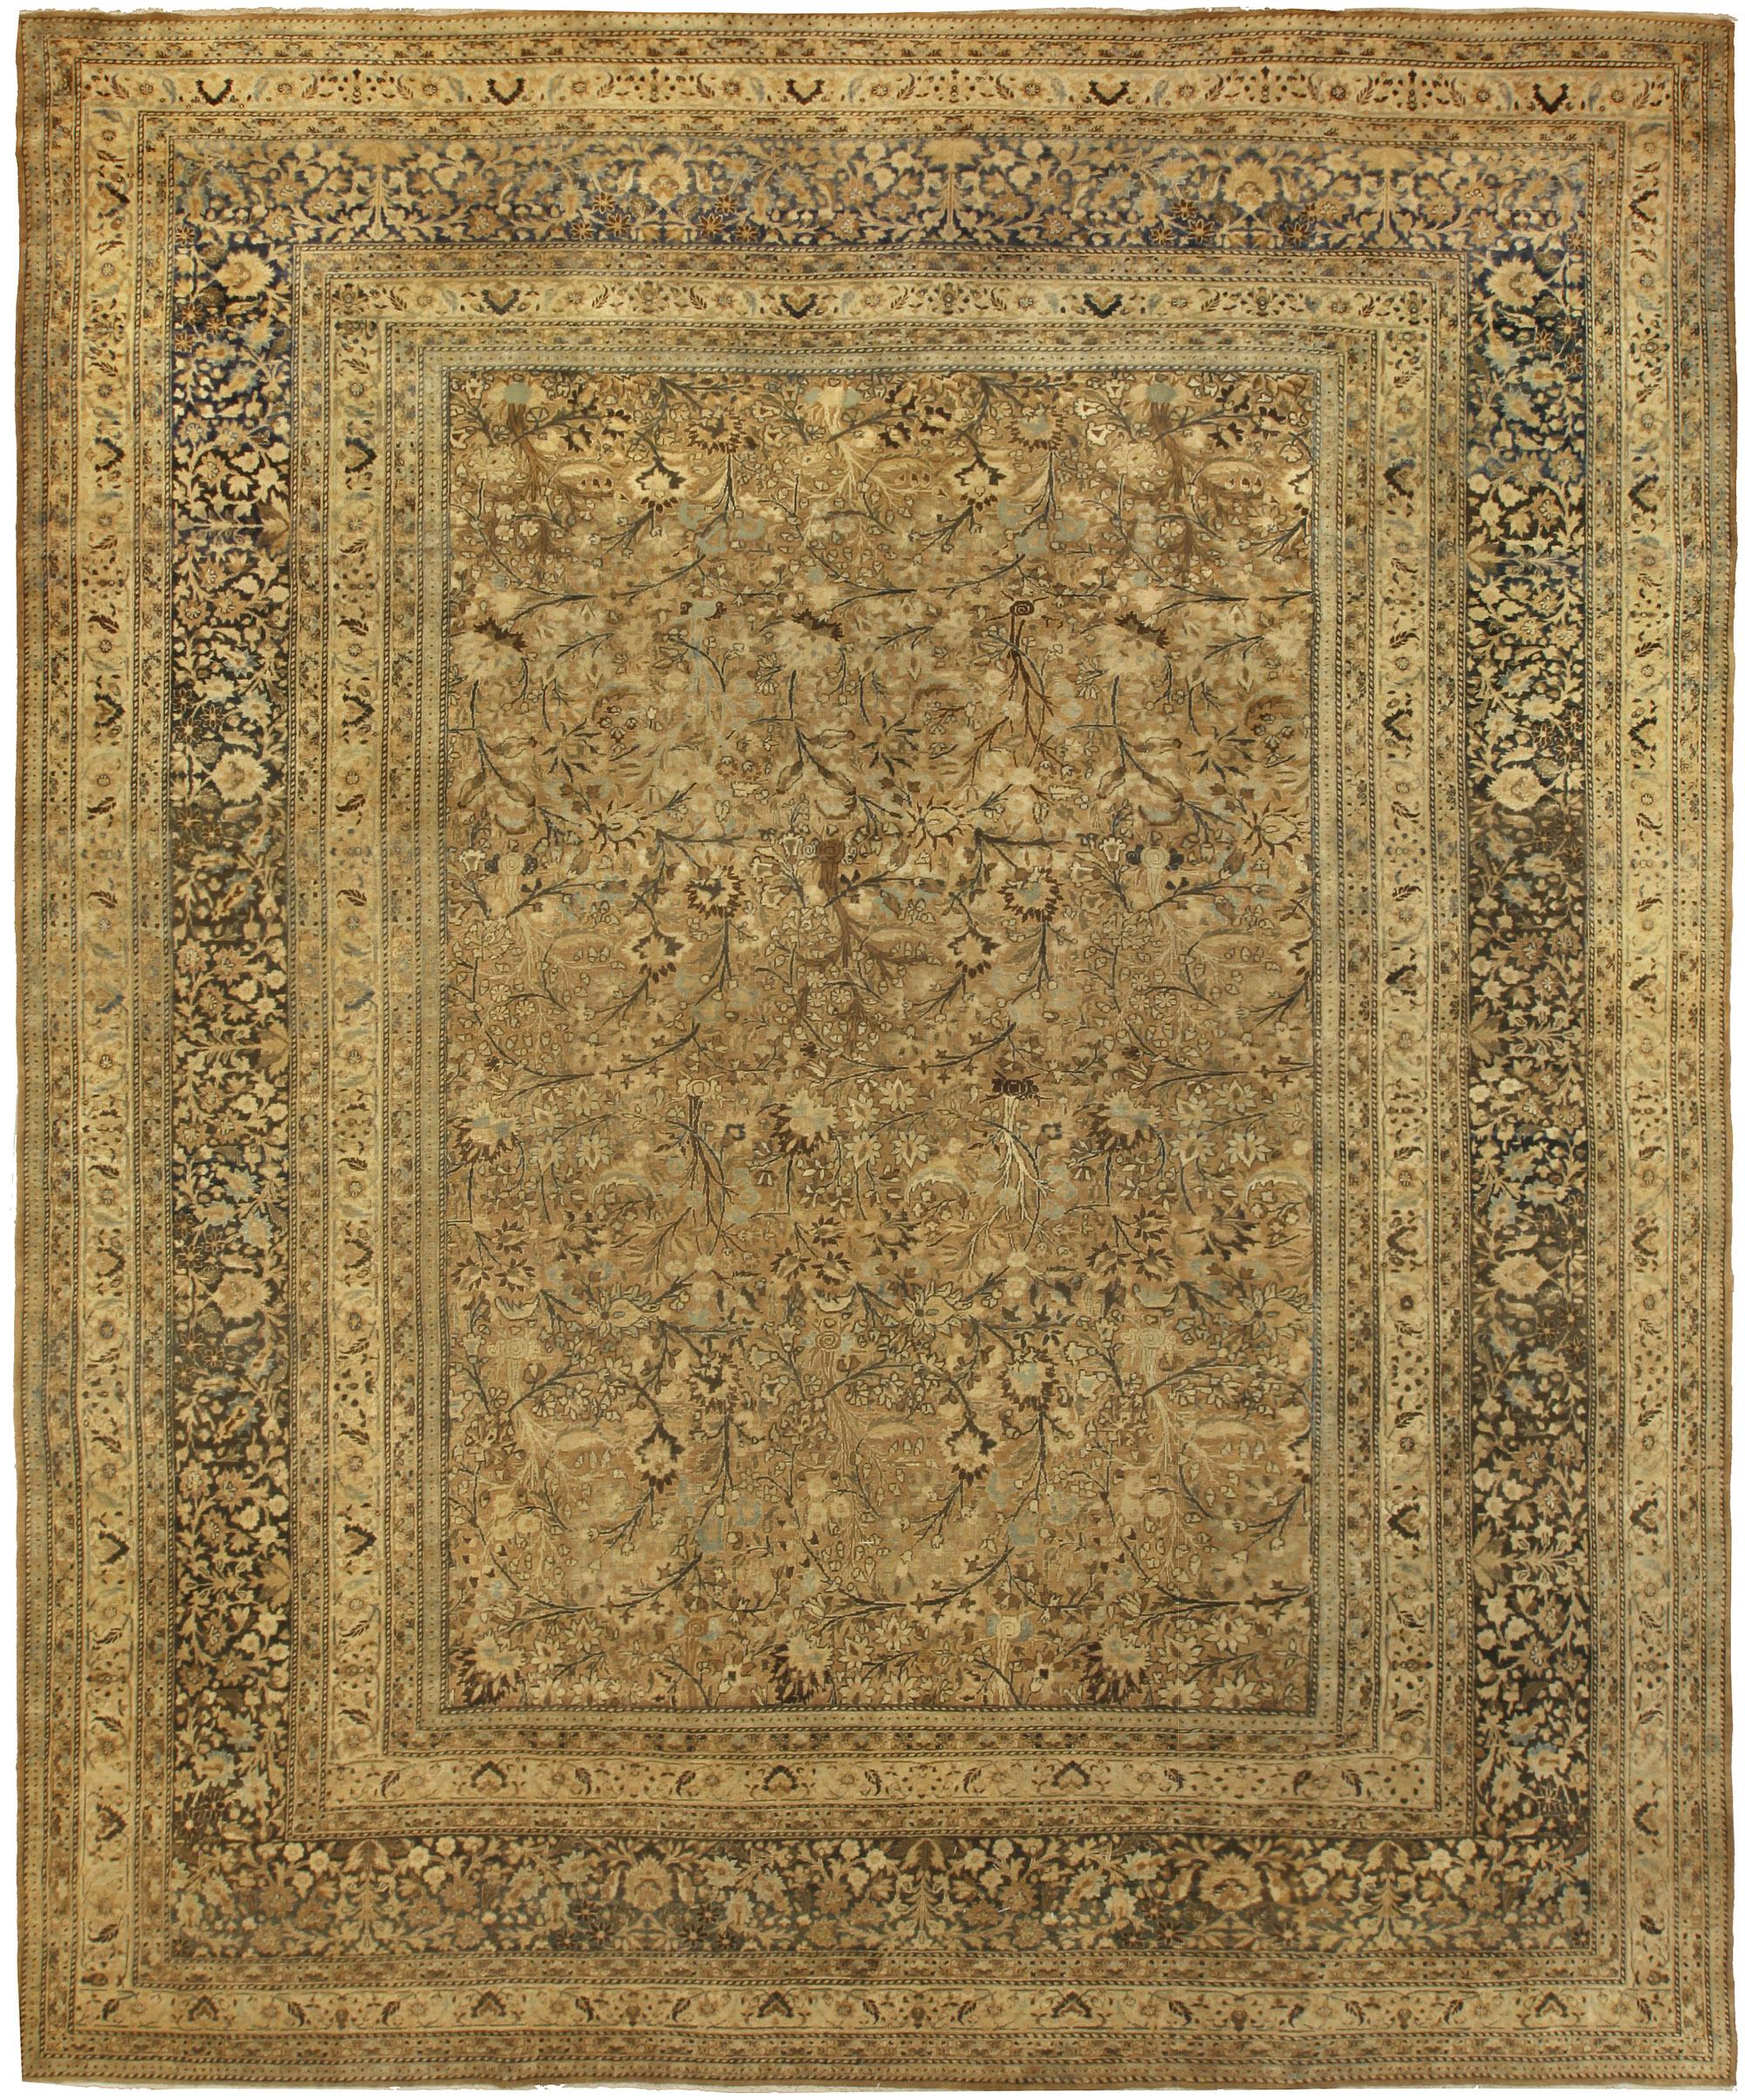 Antique Khorassan Rug BB5259